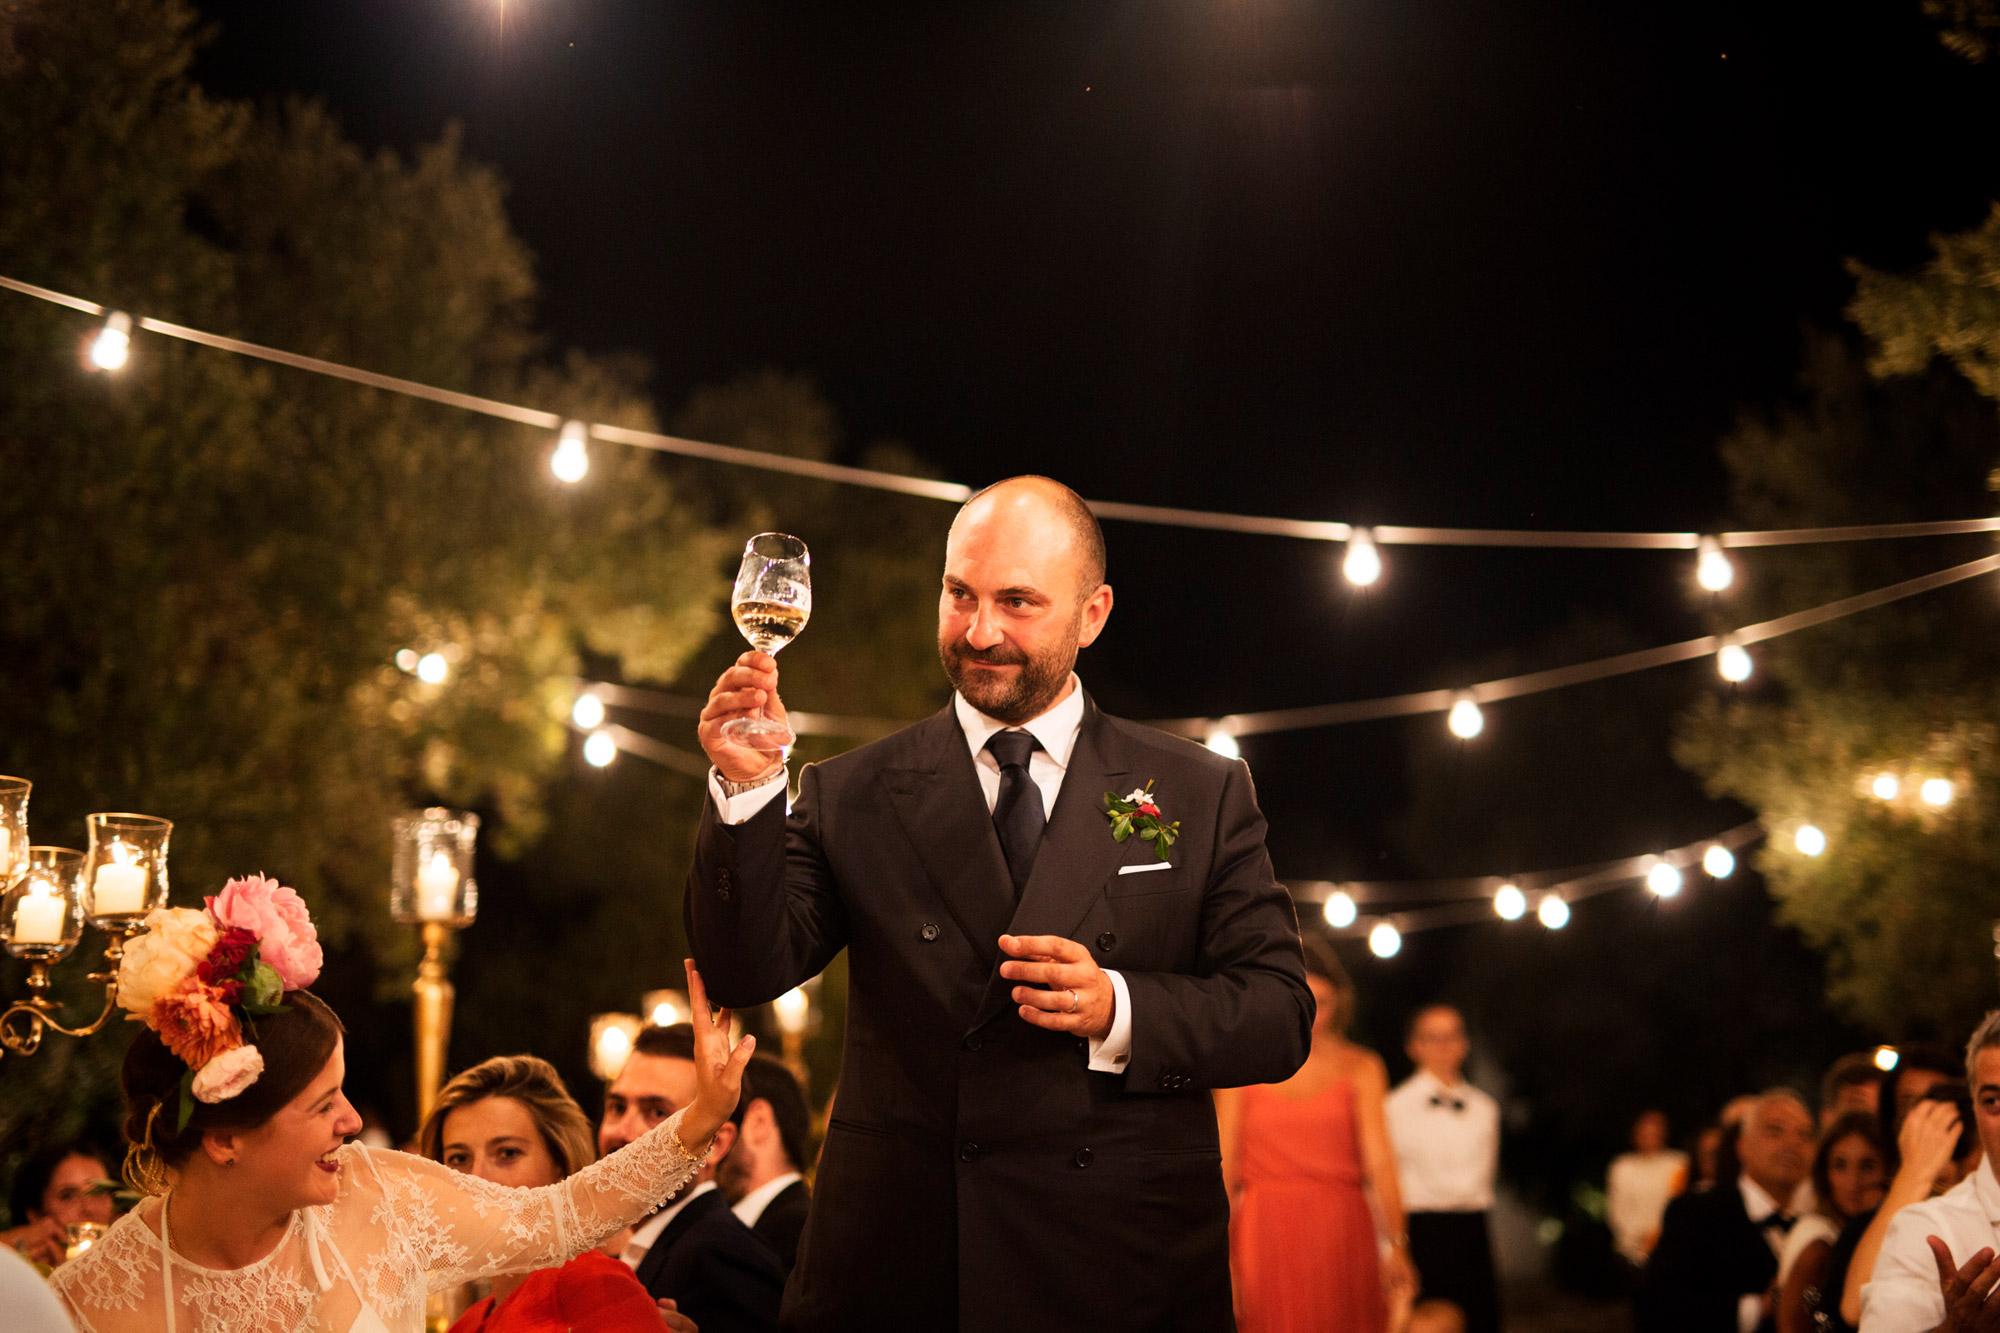 251-FIKUS-PUGLIA-wedding-ostuni-masseria.jpg